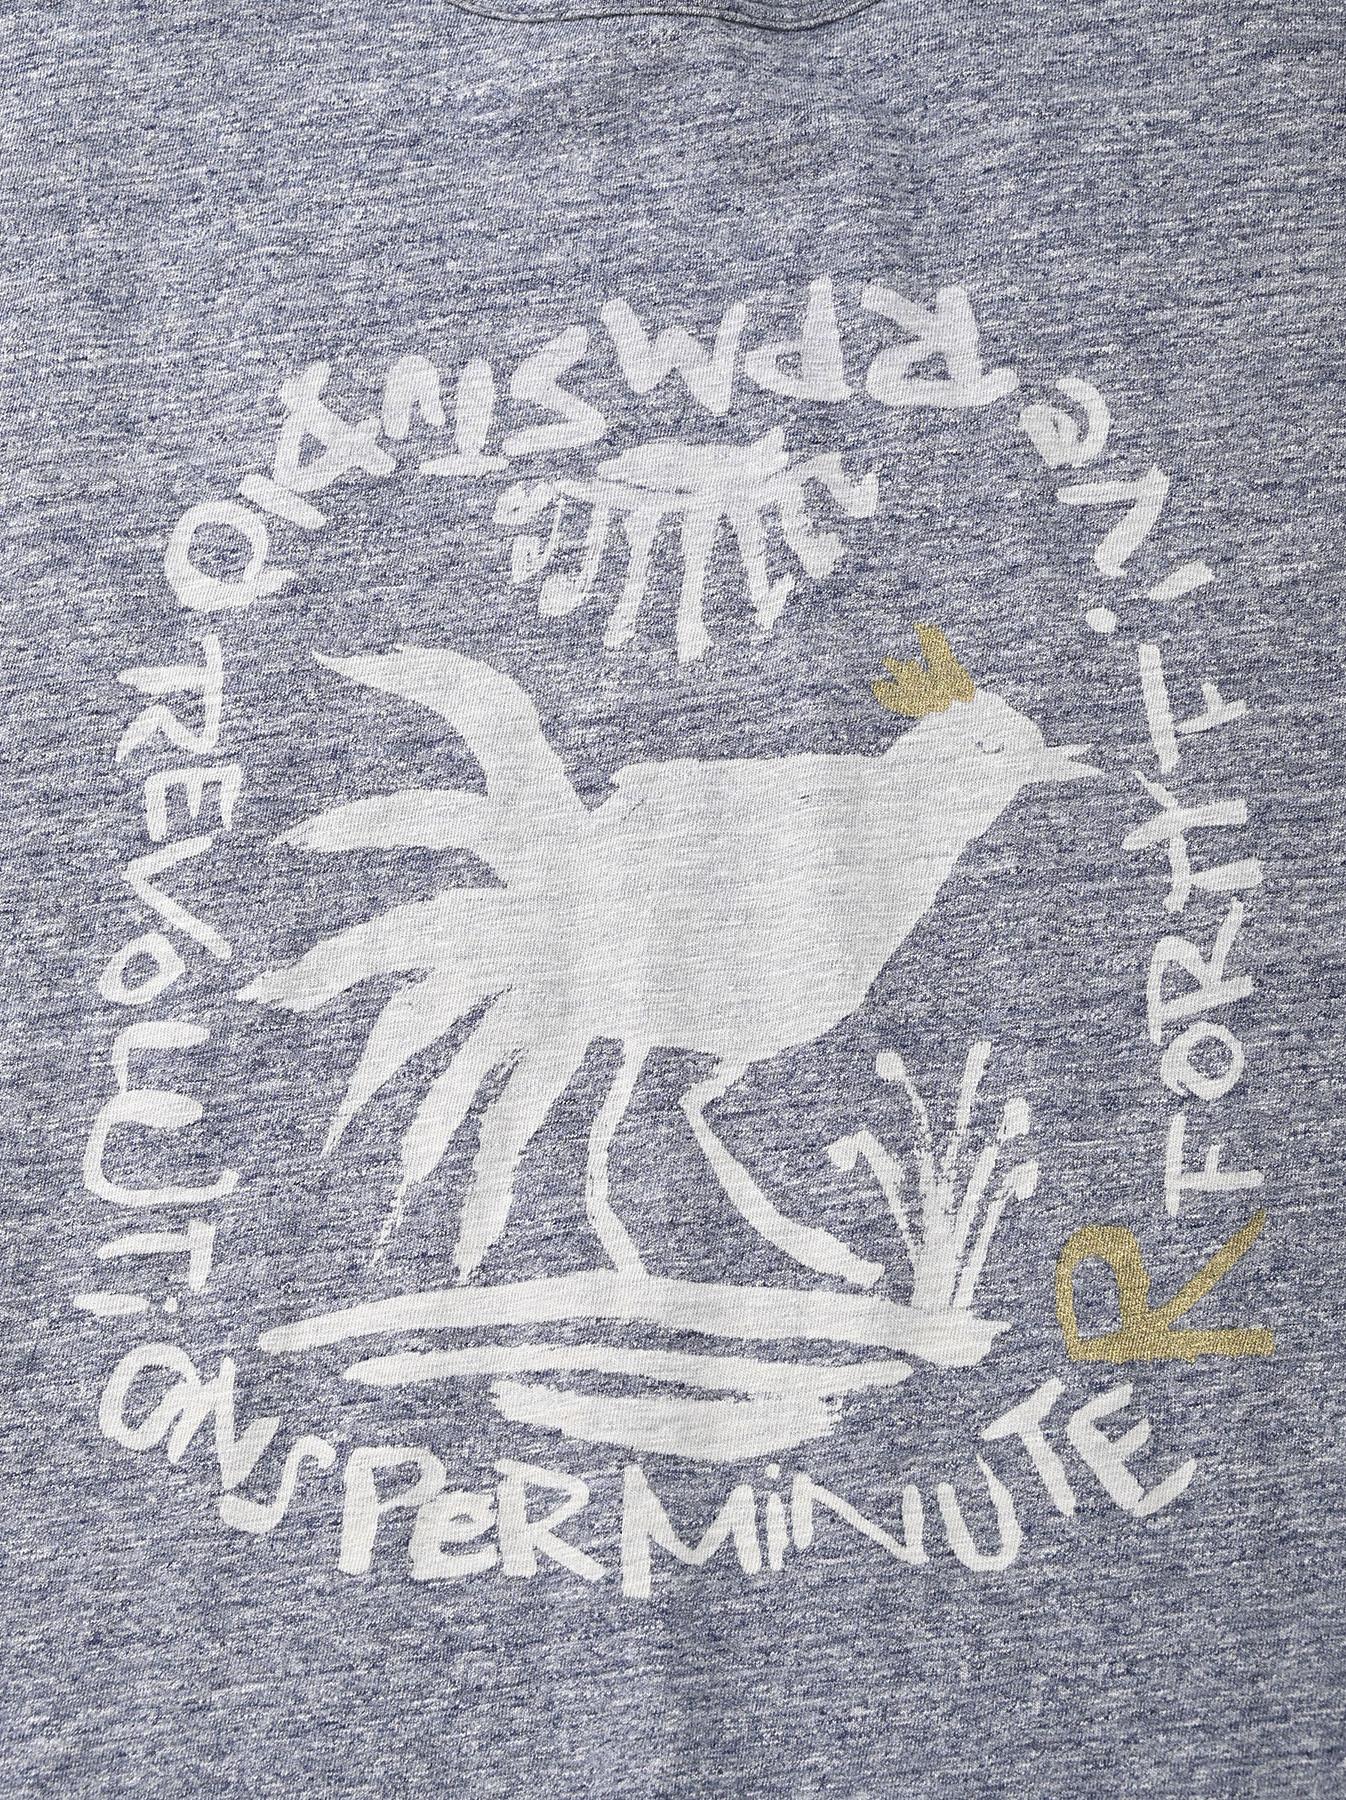 Top Sumite de Chicken T-shirt-7